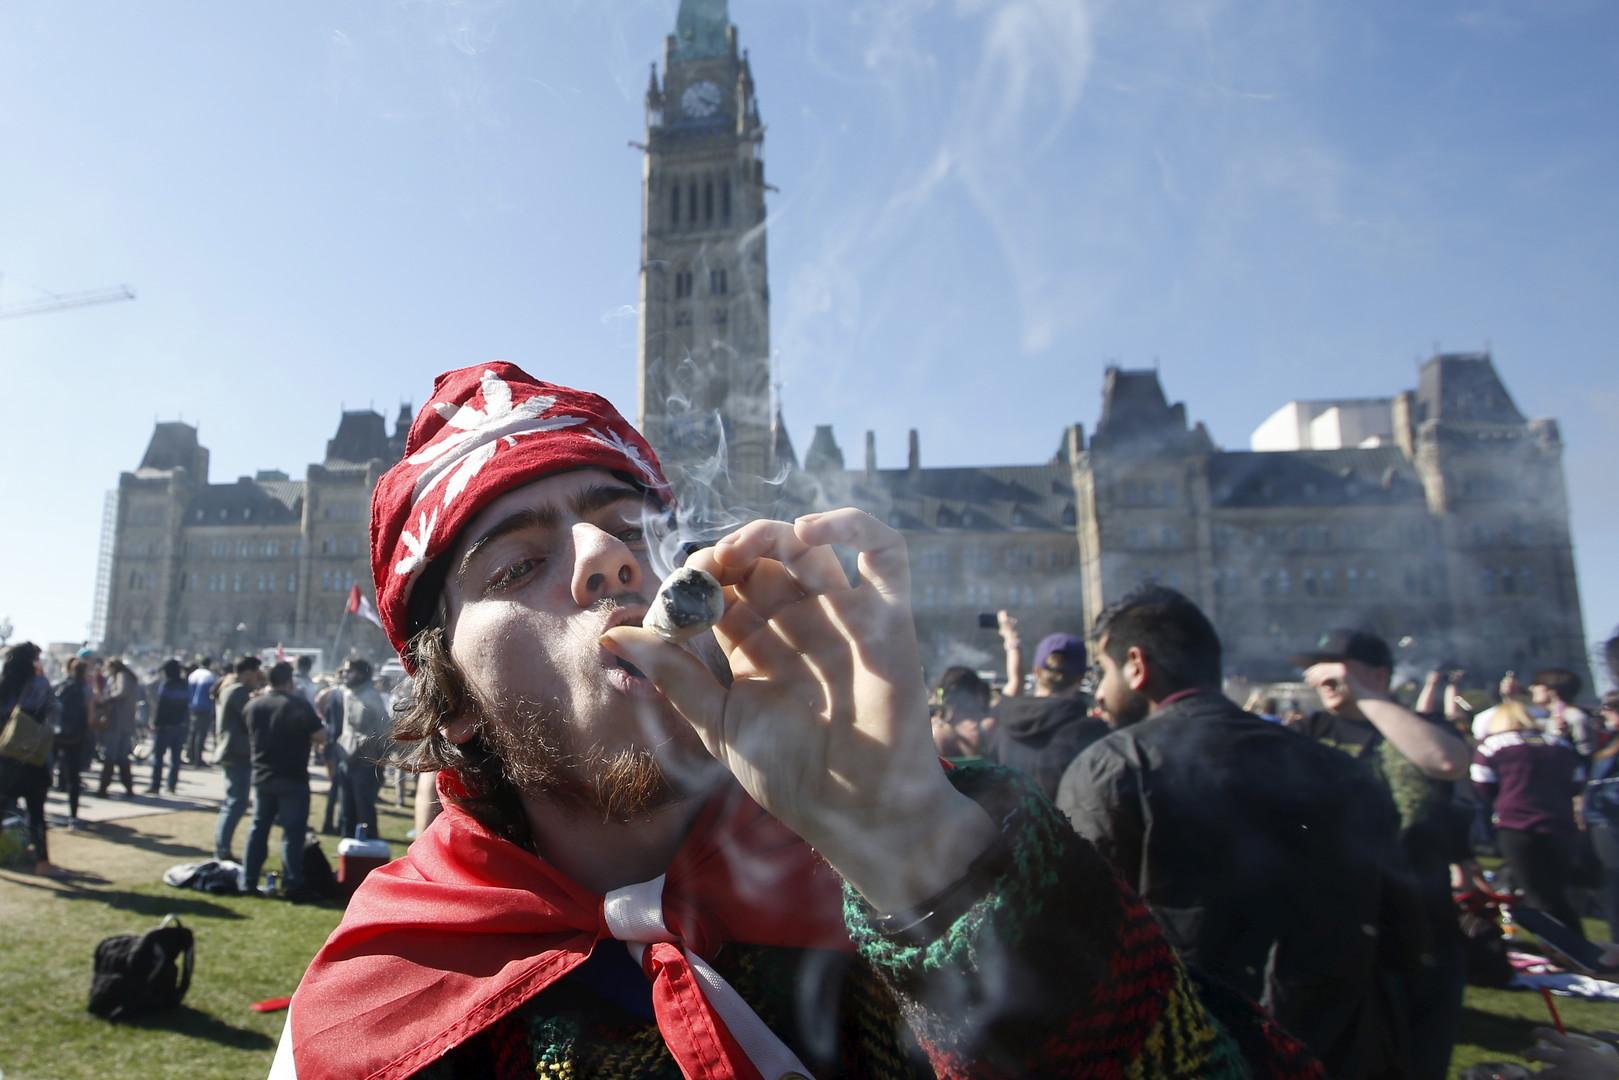 La légalisation de la marijuana au Canada n'a pas que des adeptes